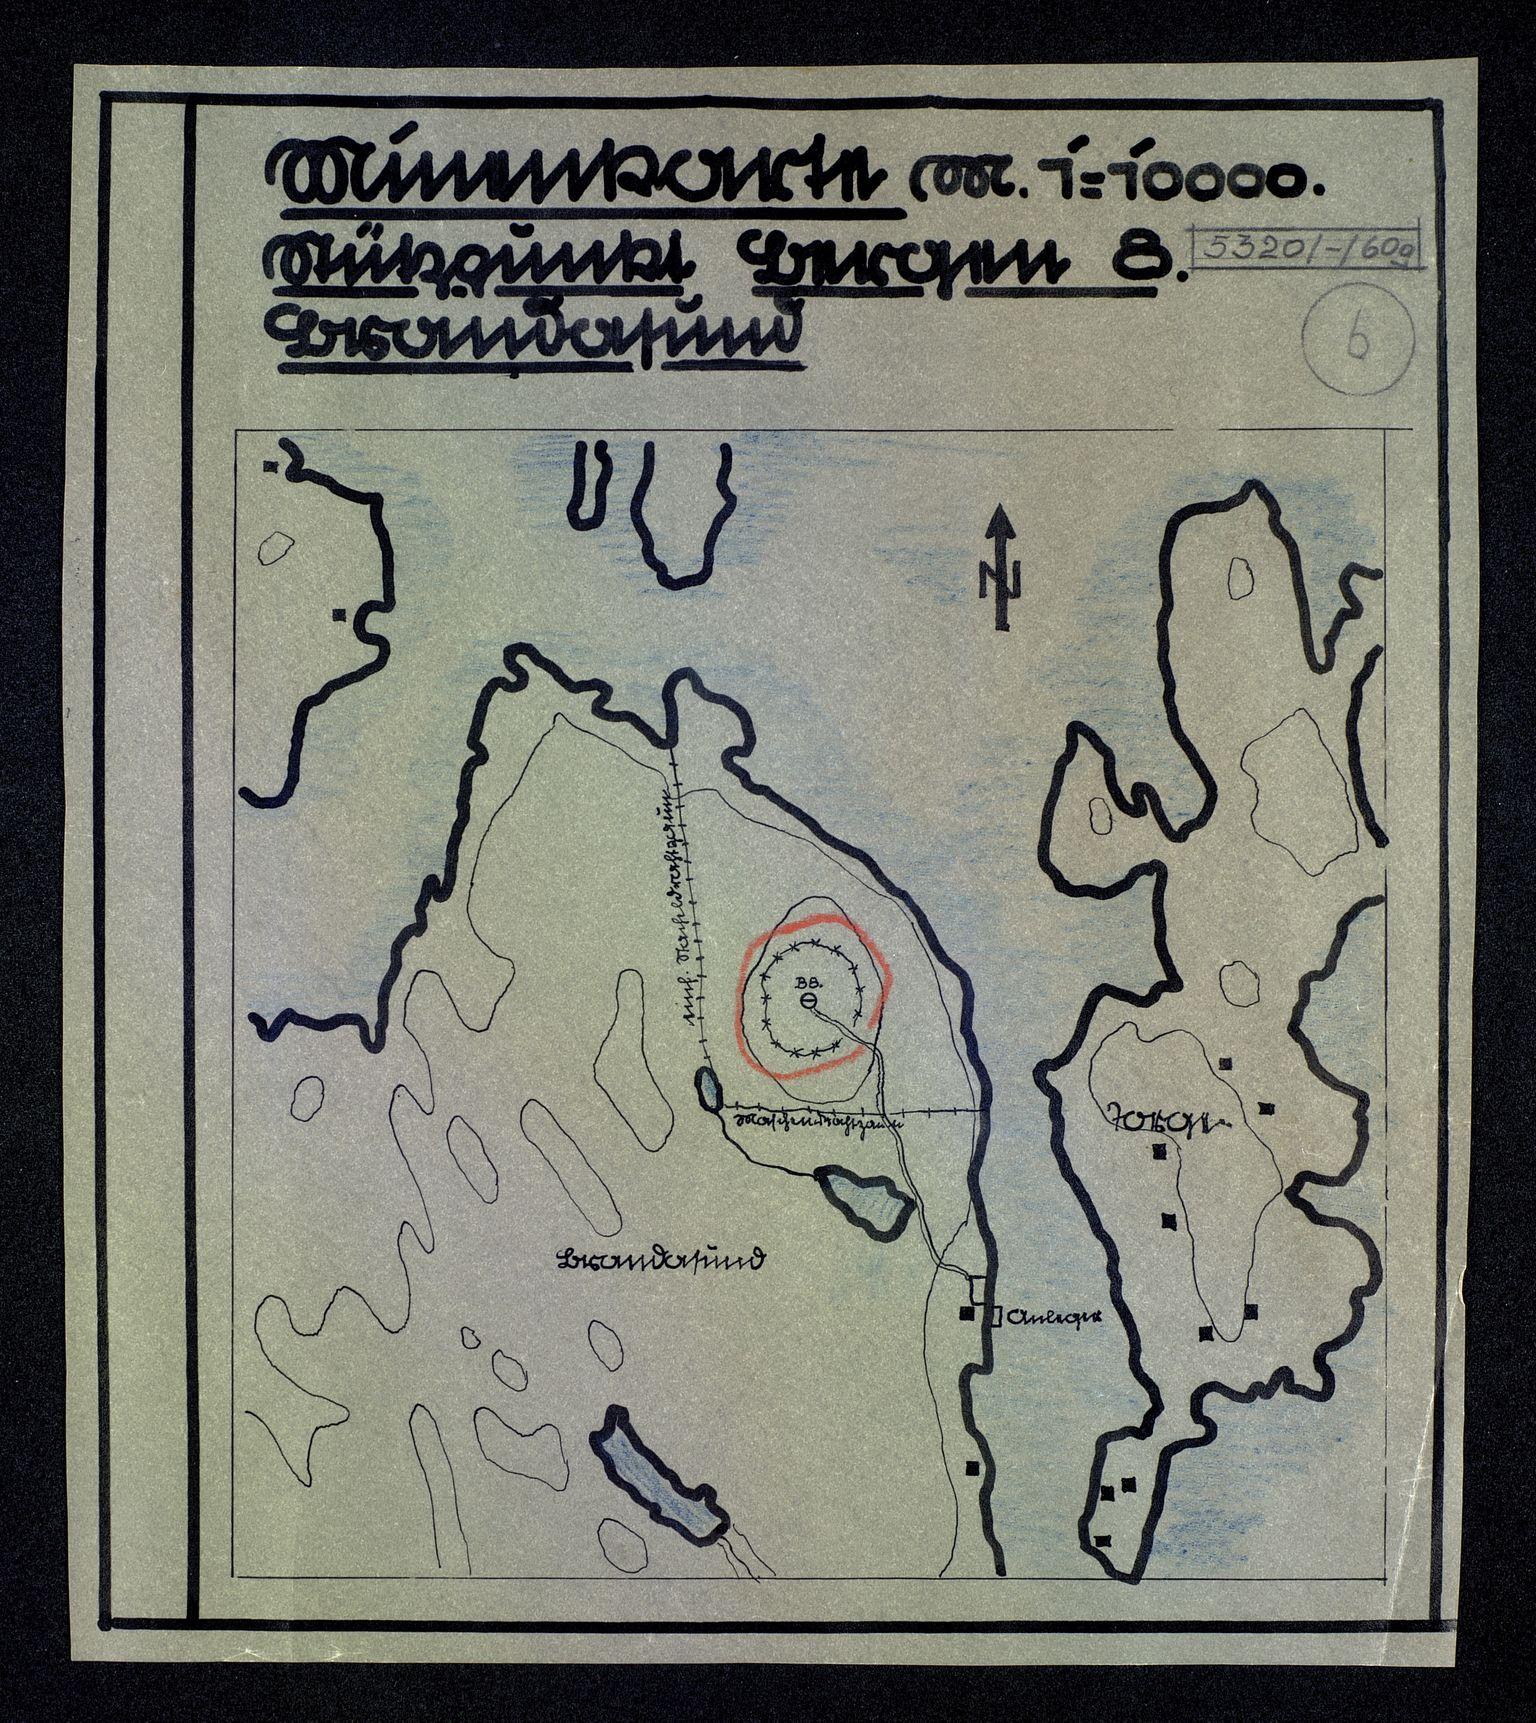 SAB, Ukjent arkiv (SAB), 1943-1945, s. 6